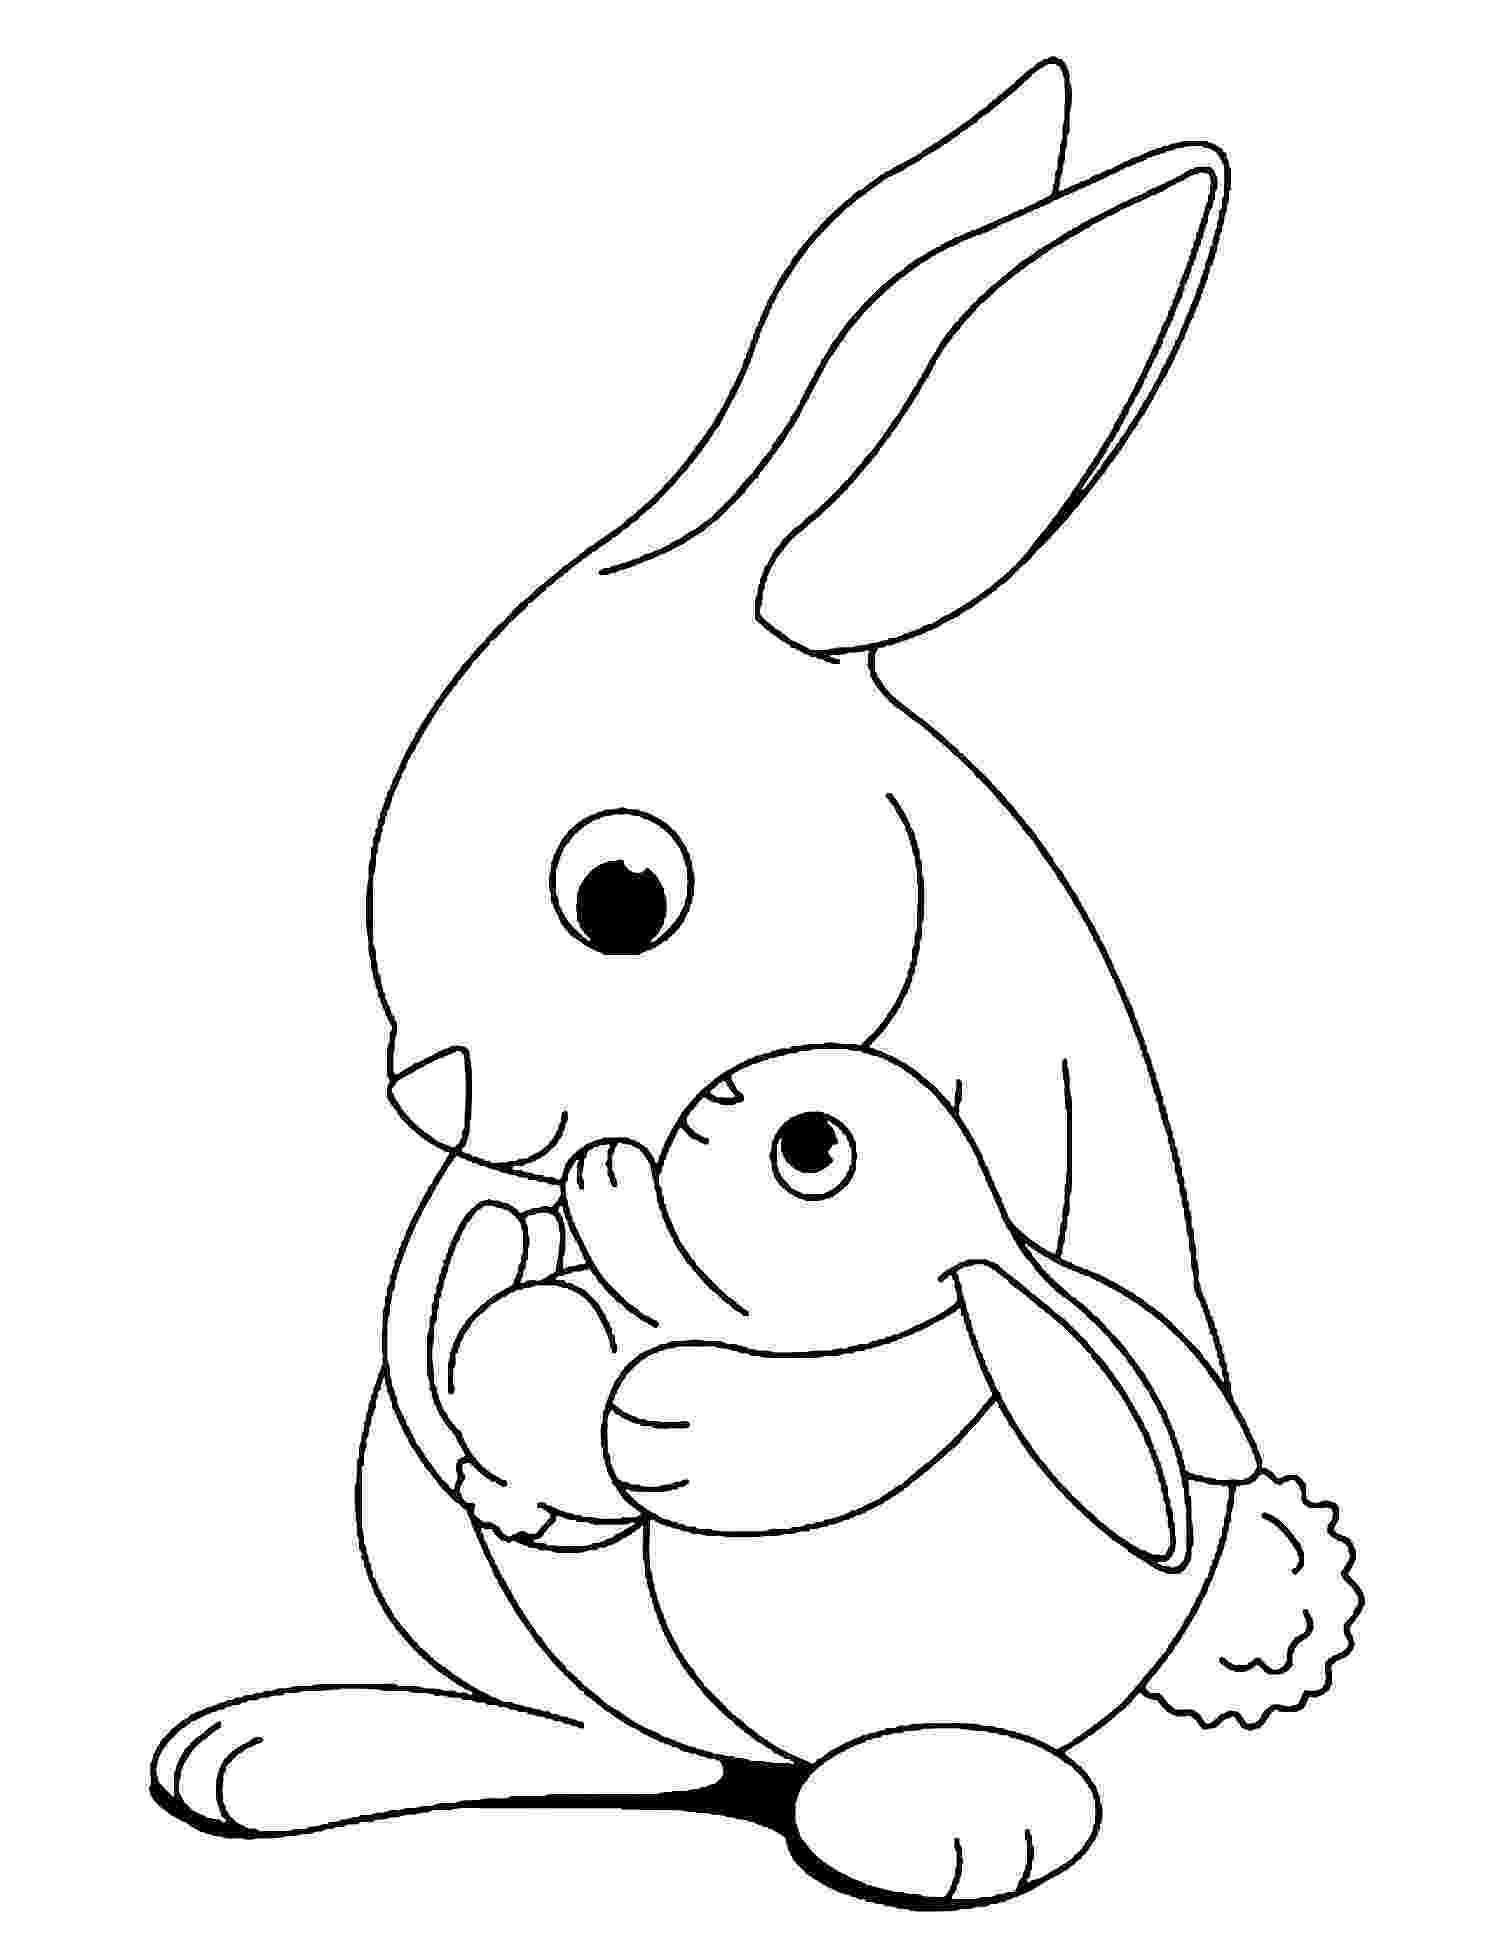 rabbit coloring pages for preschoolers rabbit to print for free rabbit kids coloring pages preschoolers coloring pages for rabbit